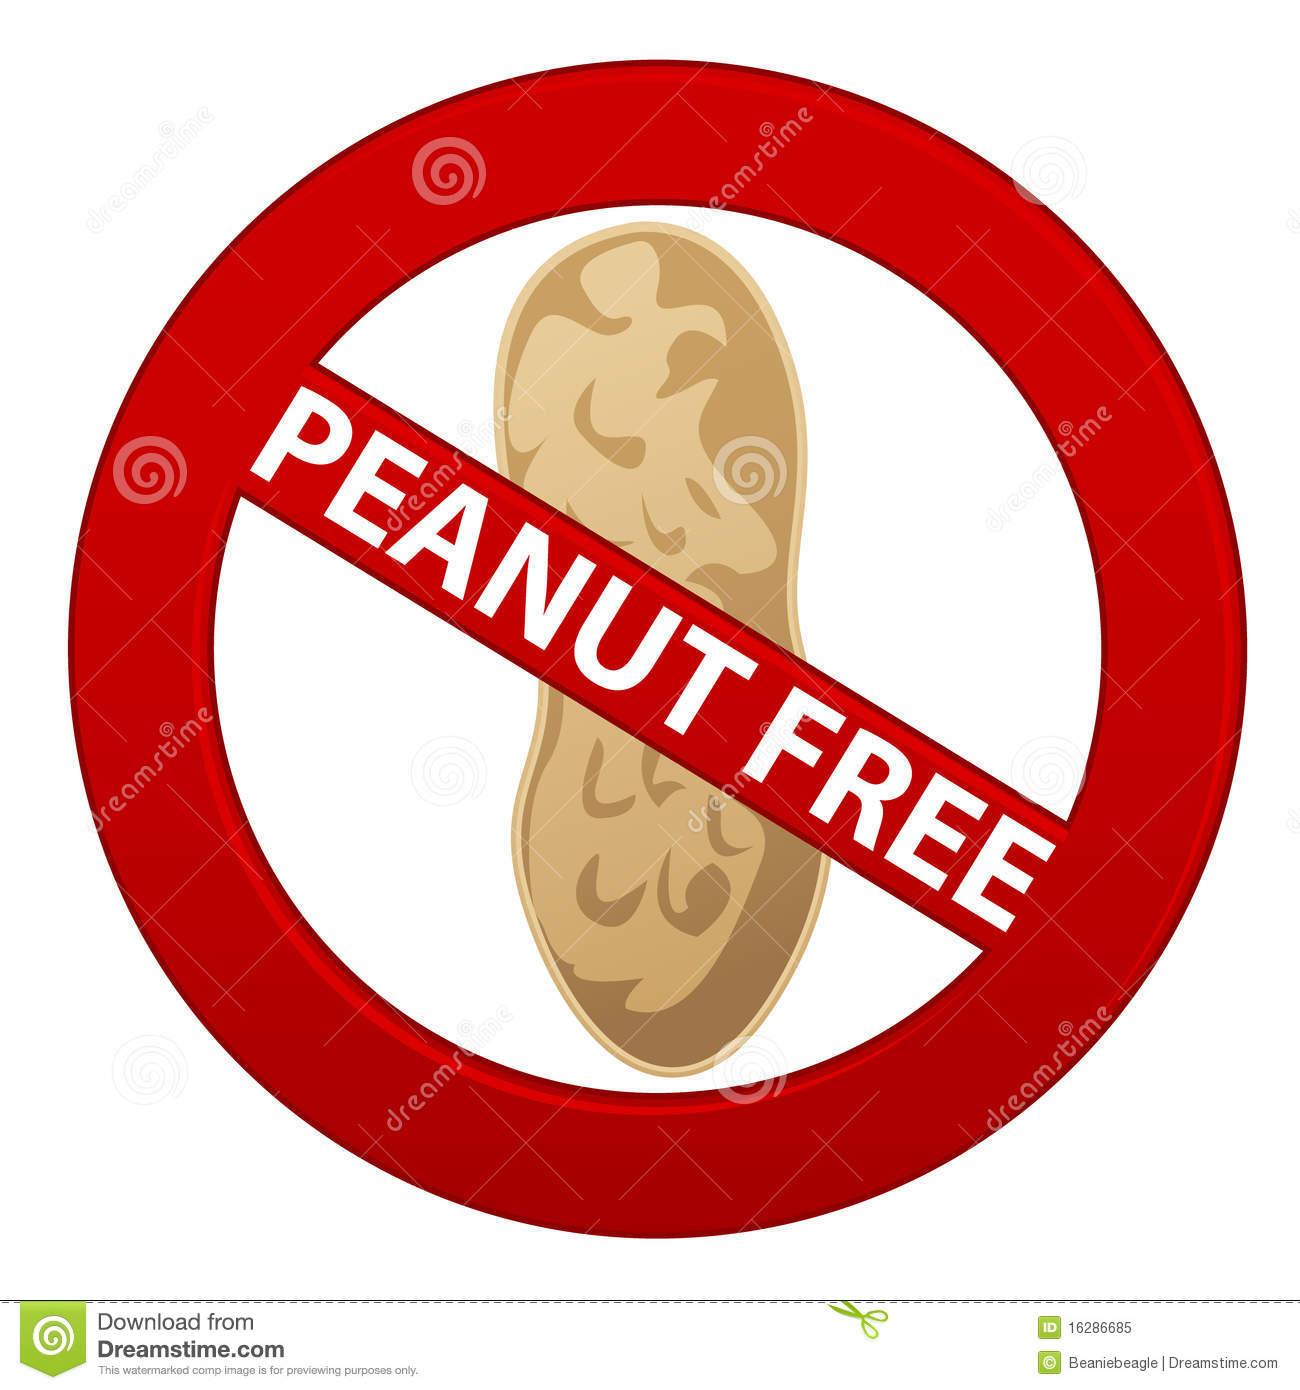 No peanuts clipart 4 » Clipart Station.